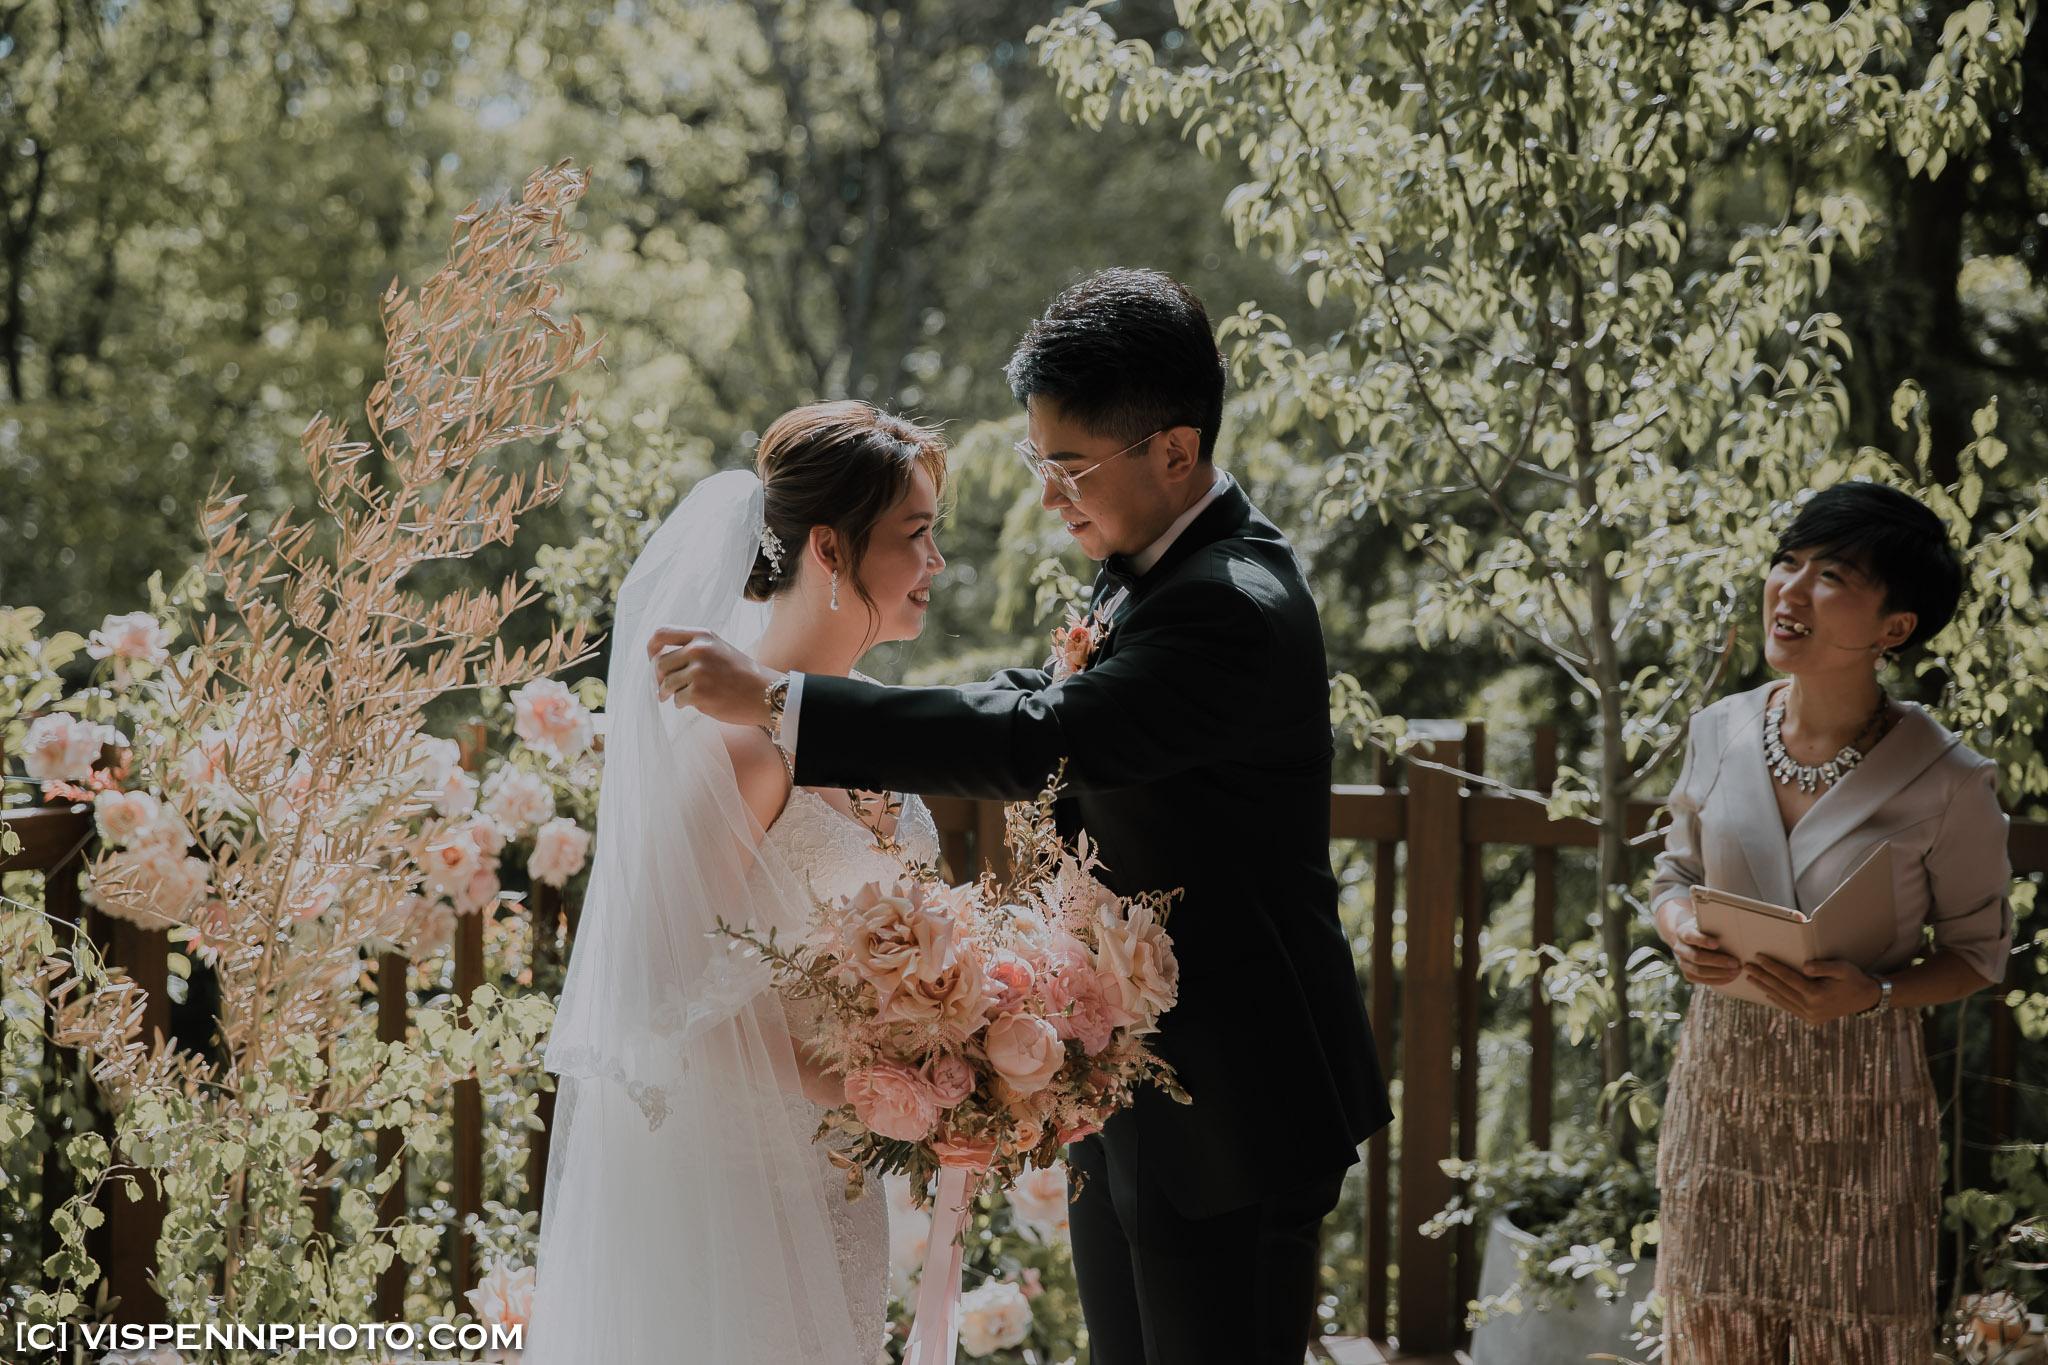 WEDDING DAY Photography Melbourne ElitaPB 07483 2P 1DX2 ZHPENN